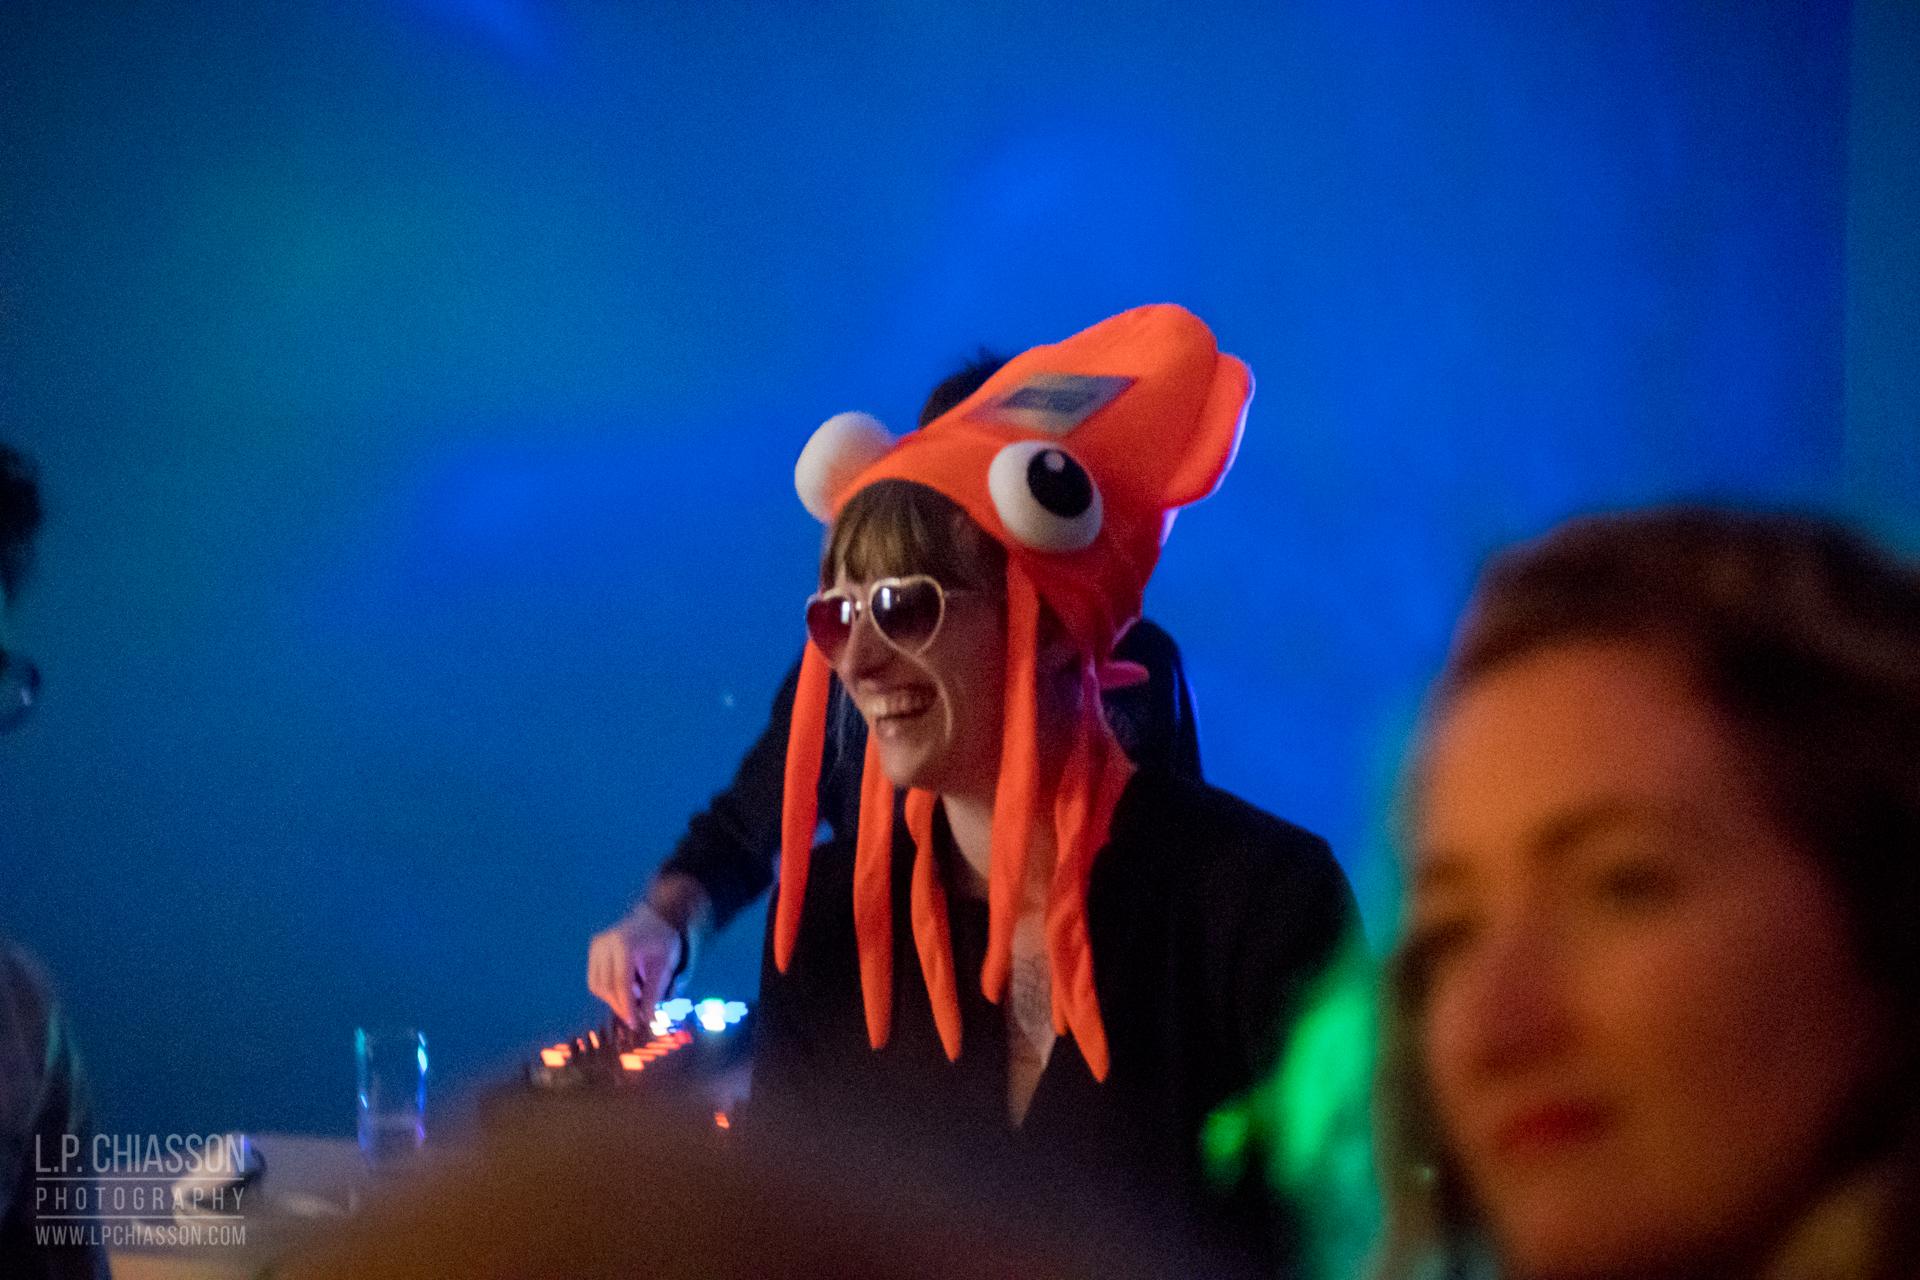 Becka Viau as a Safety Squid. Photo: LP Chiasson & Festival Inspire.